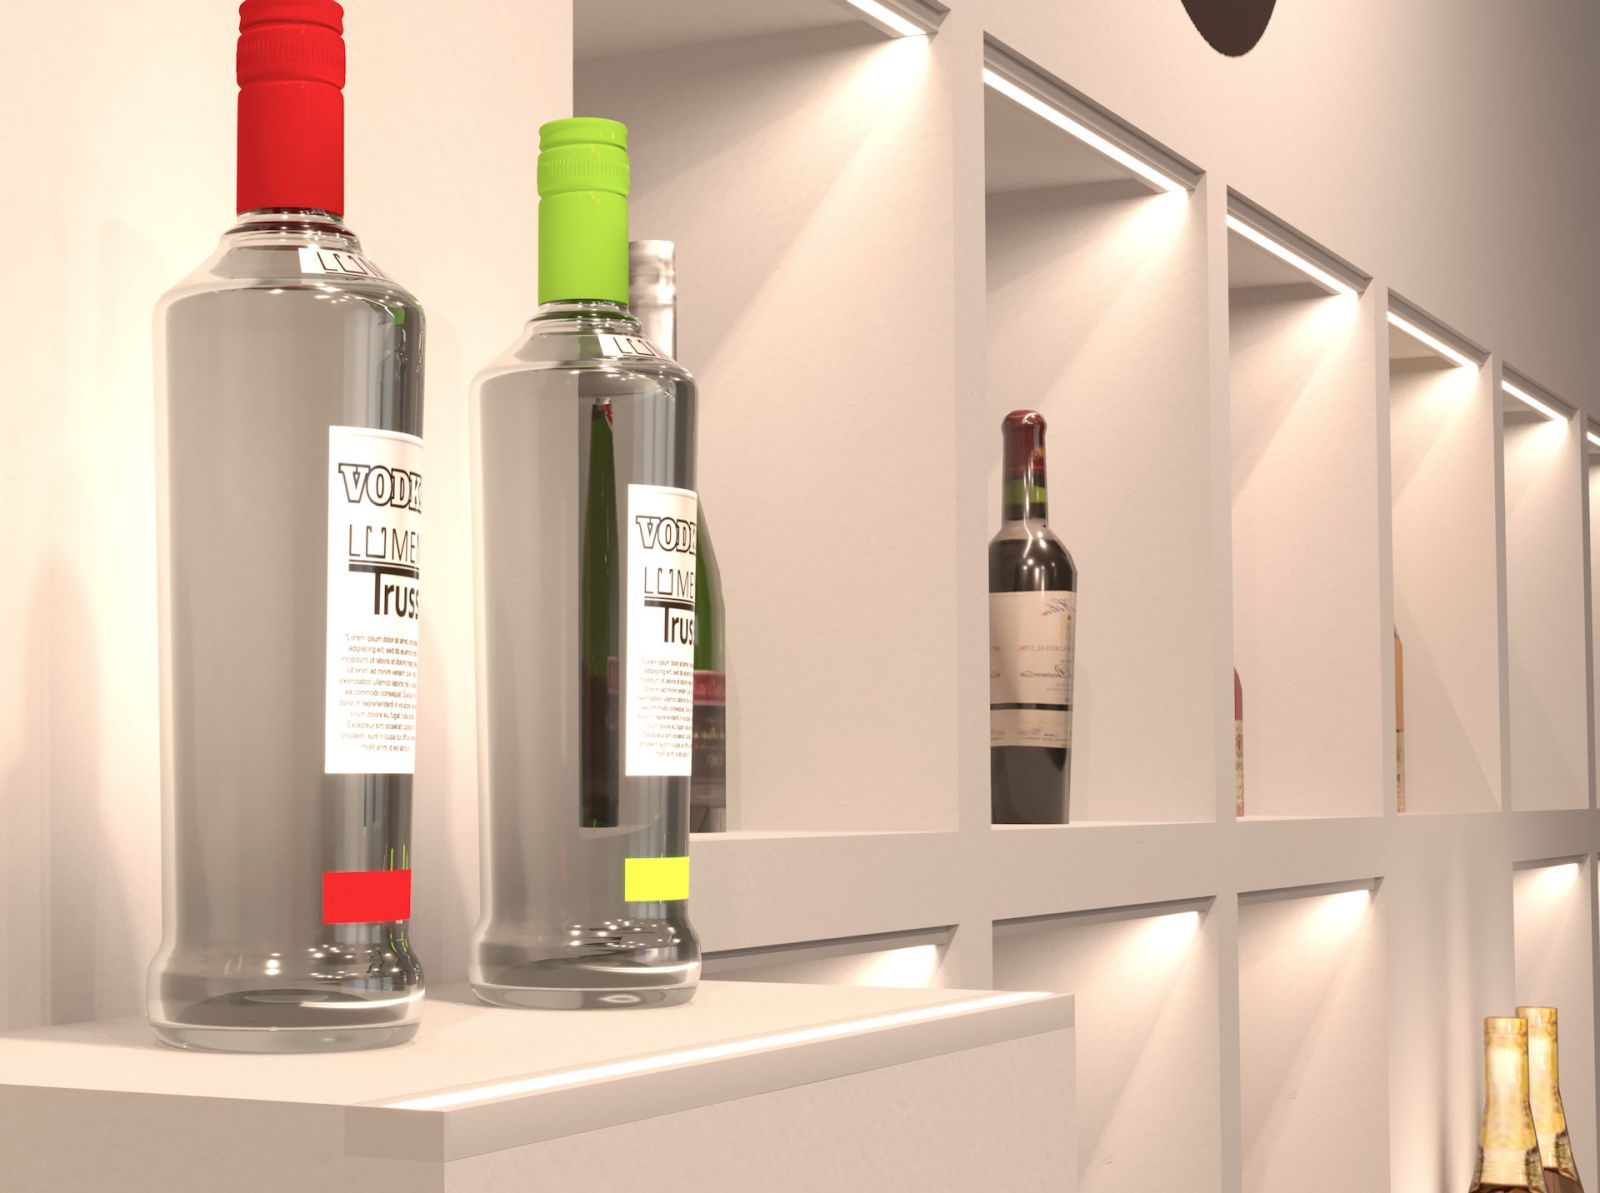 4260: Liquor Store Detail